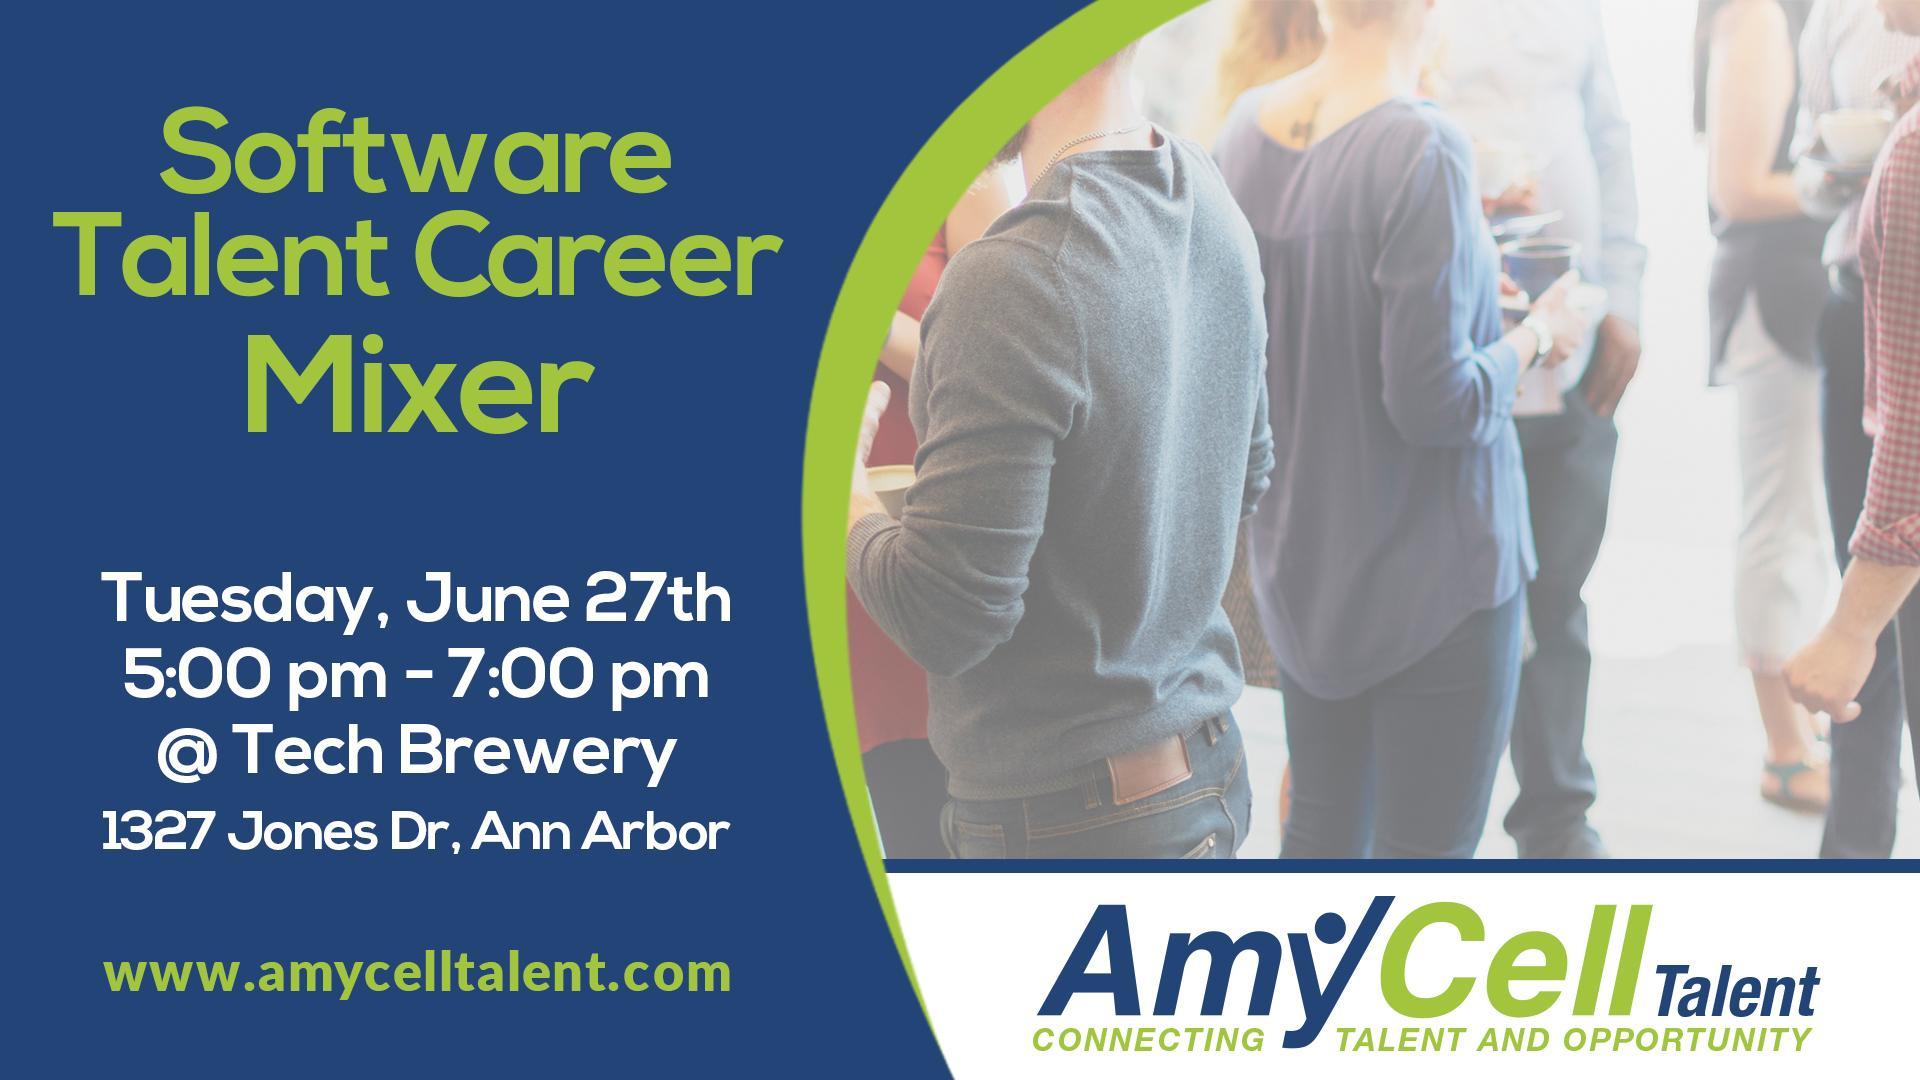 Software Talent Career Mixer